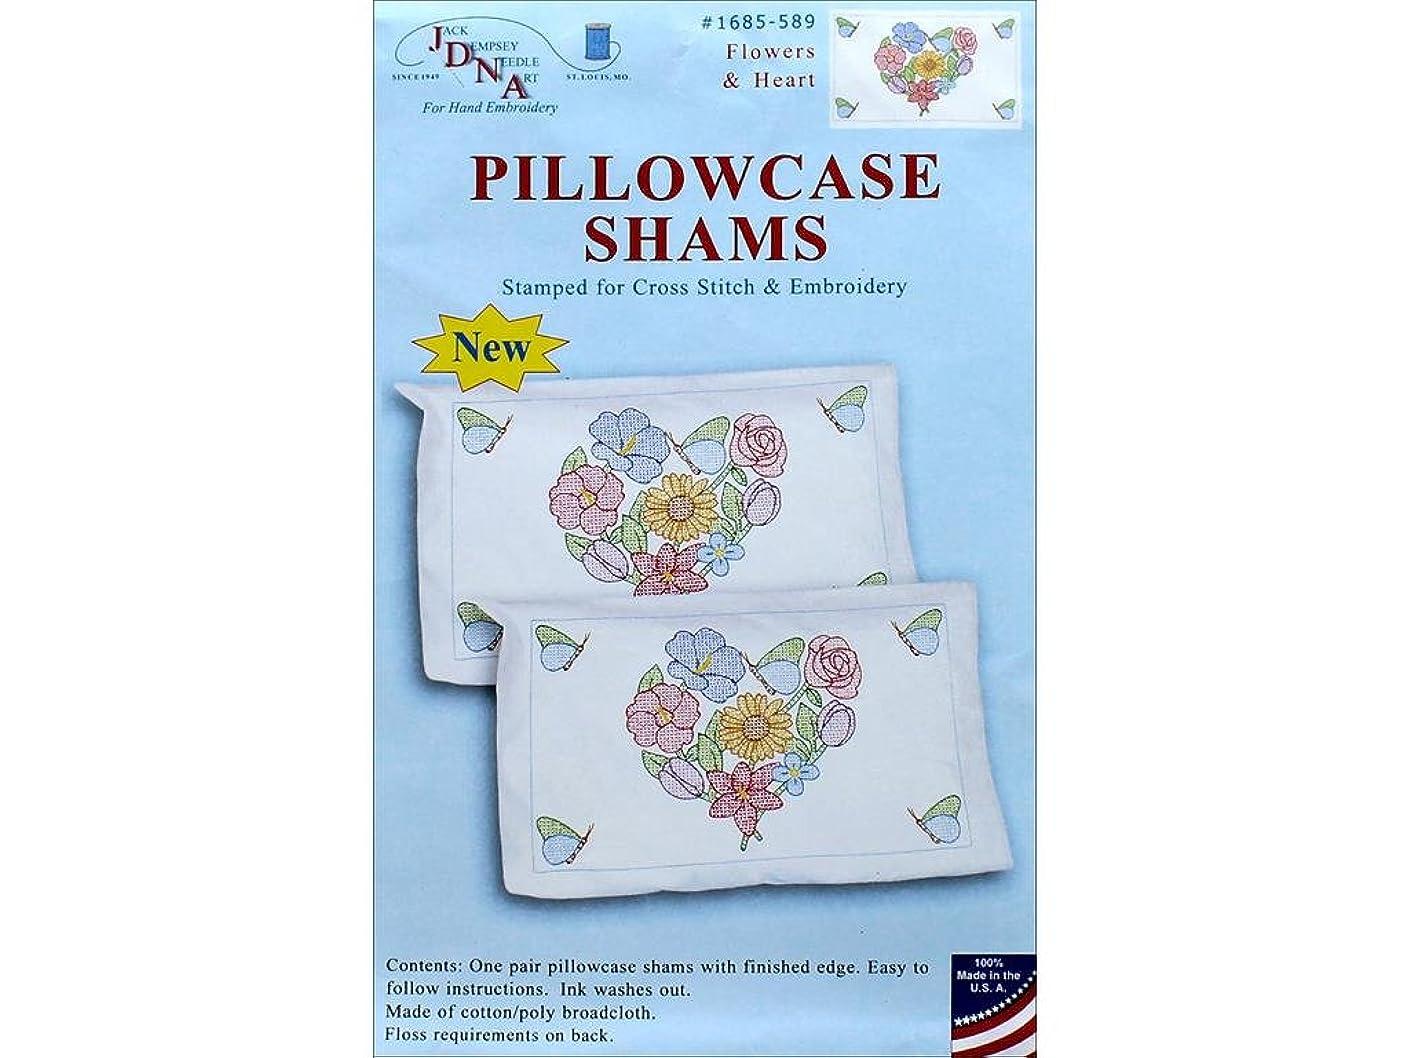 Jack Dempsey JDN1685.589 Pillowcase Sham Flowers & Hearts Pillowcase Sham Flowers&Hearts